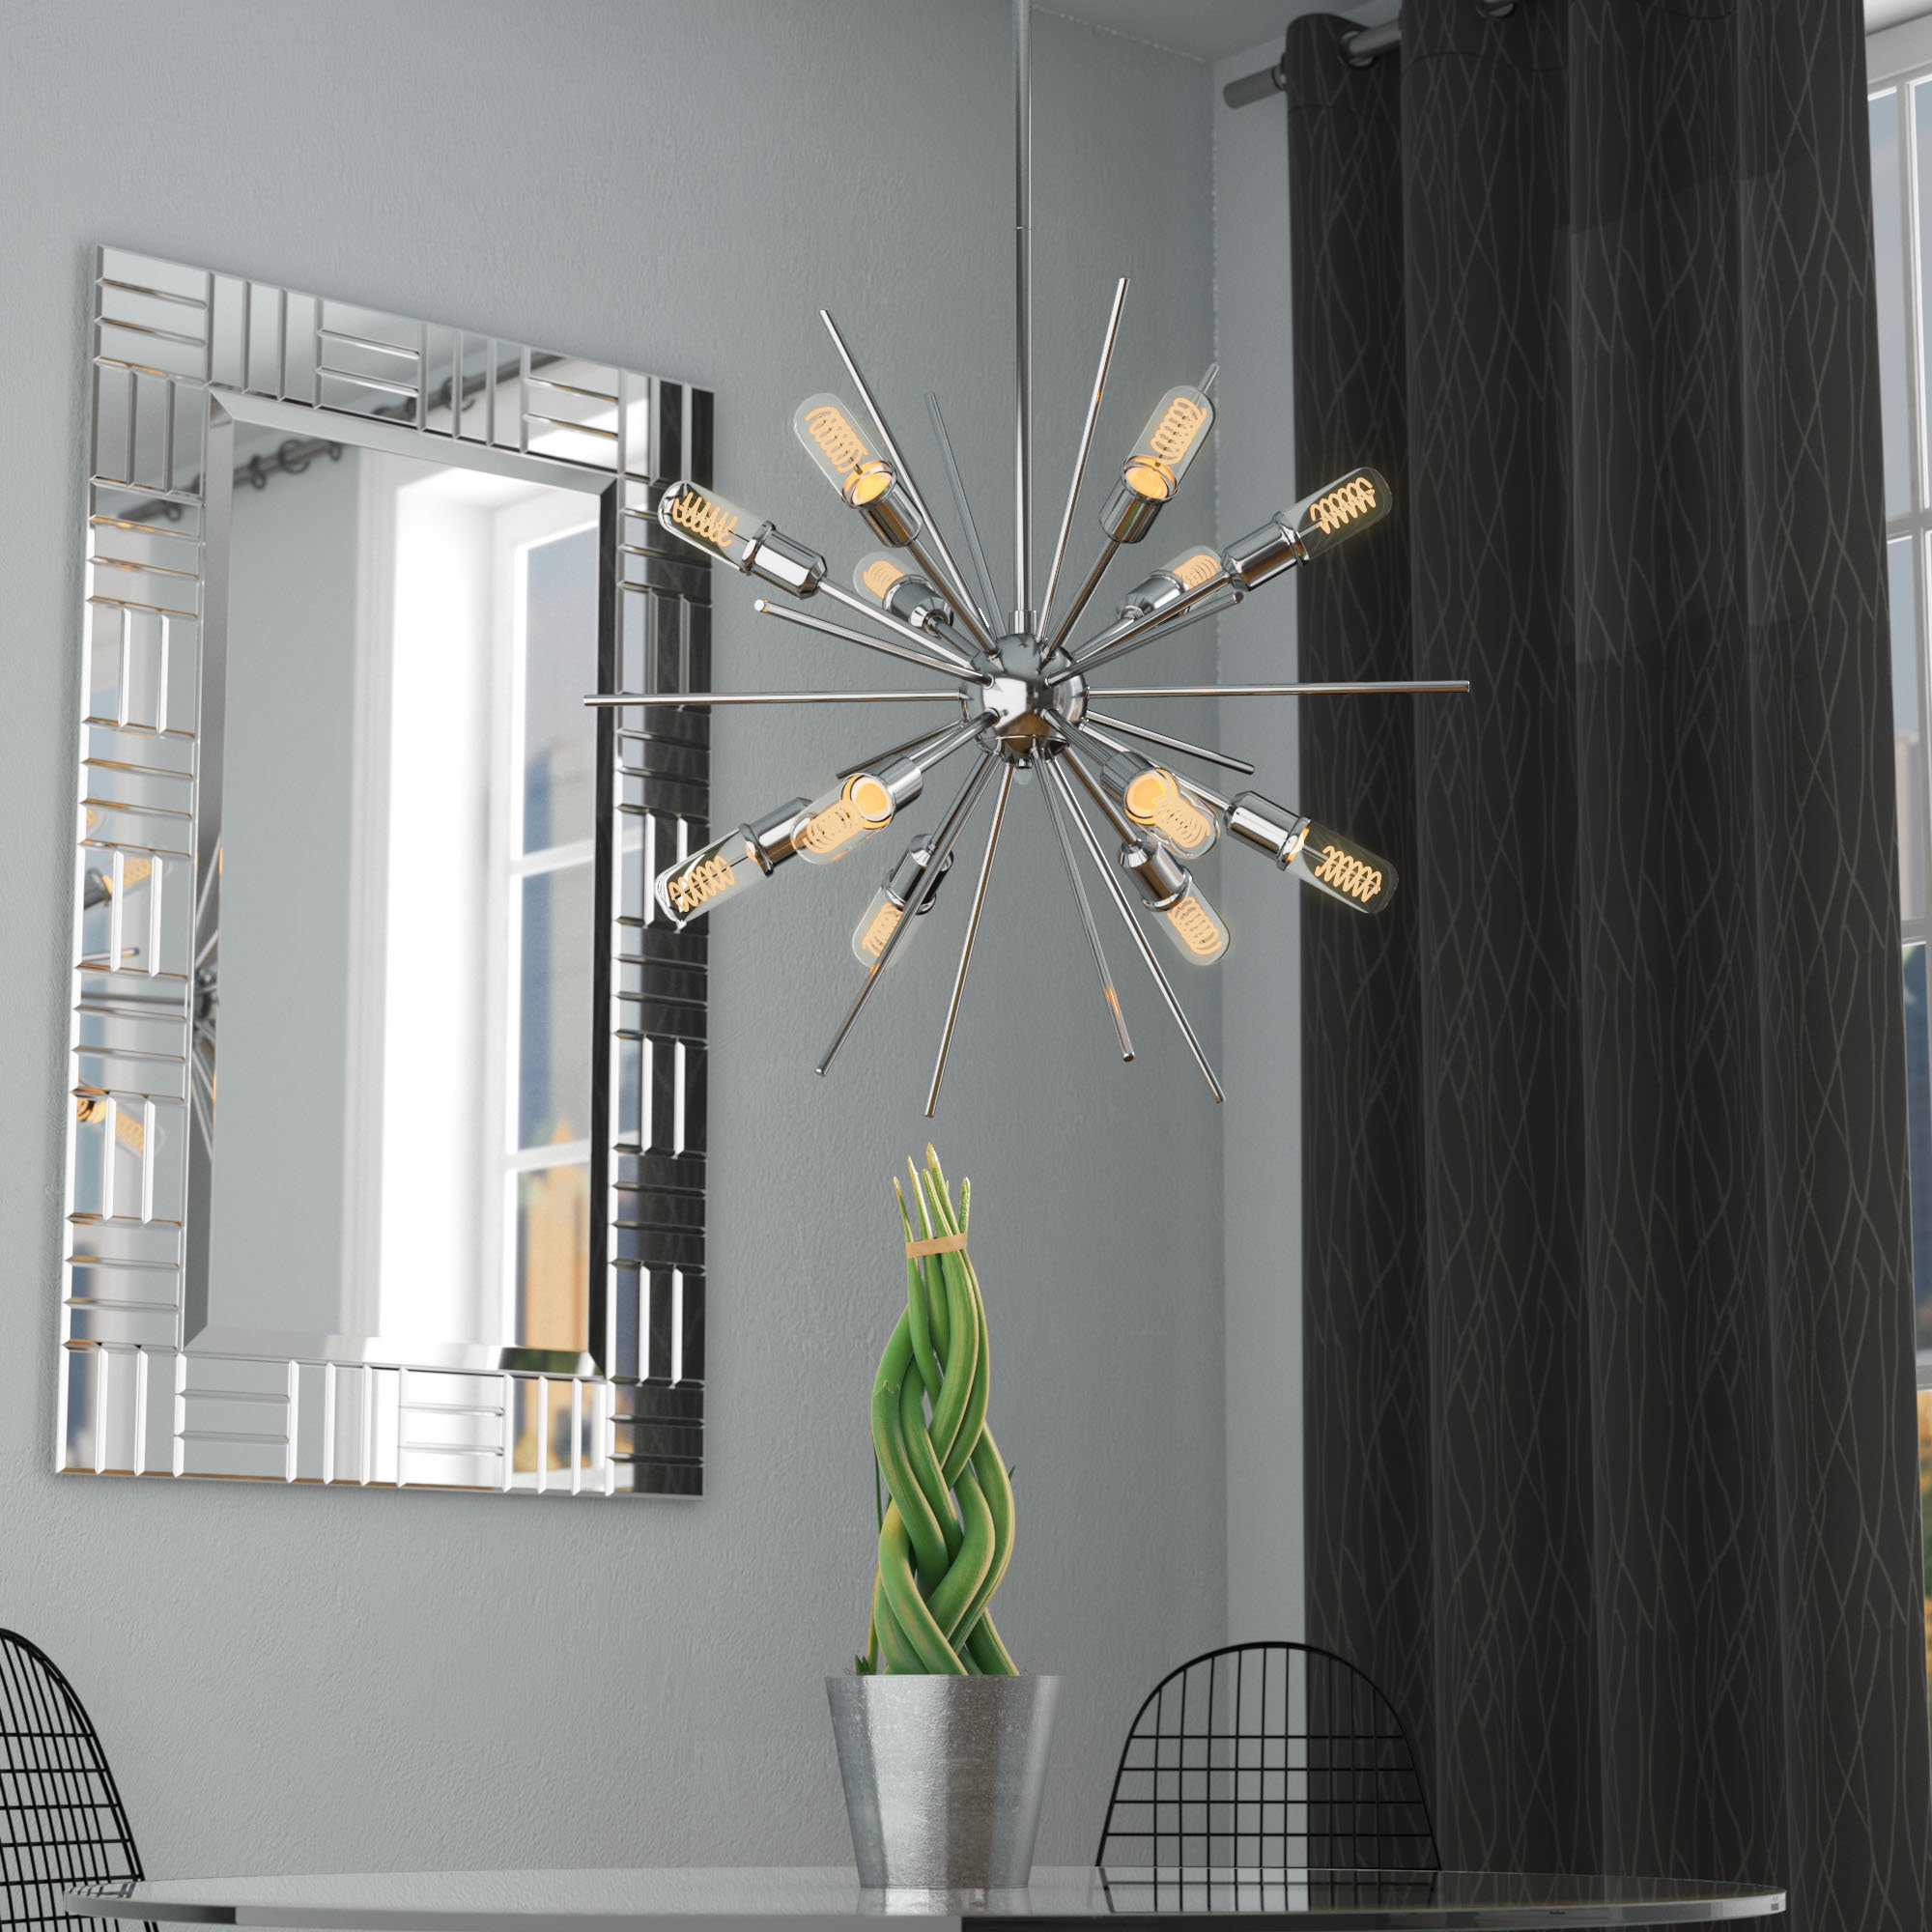 Well Liked Bacchus 12 Light Sputnik Chandeliers Throughout Corona 12 Light Sputnik Chandelier (View 17 of 20)